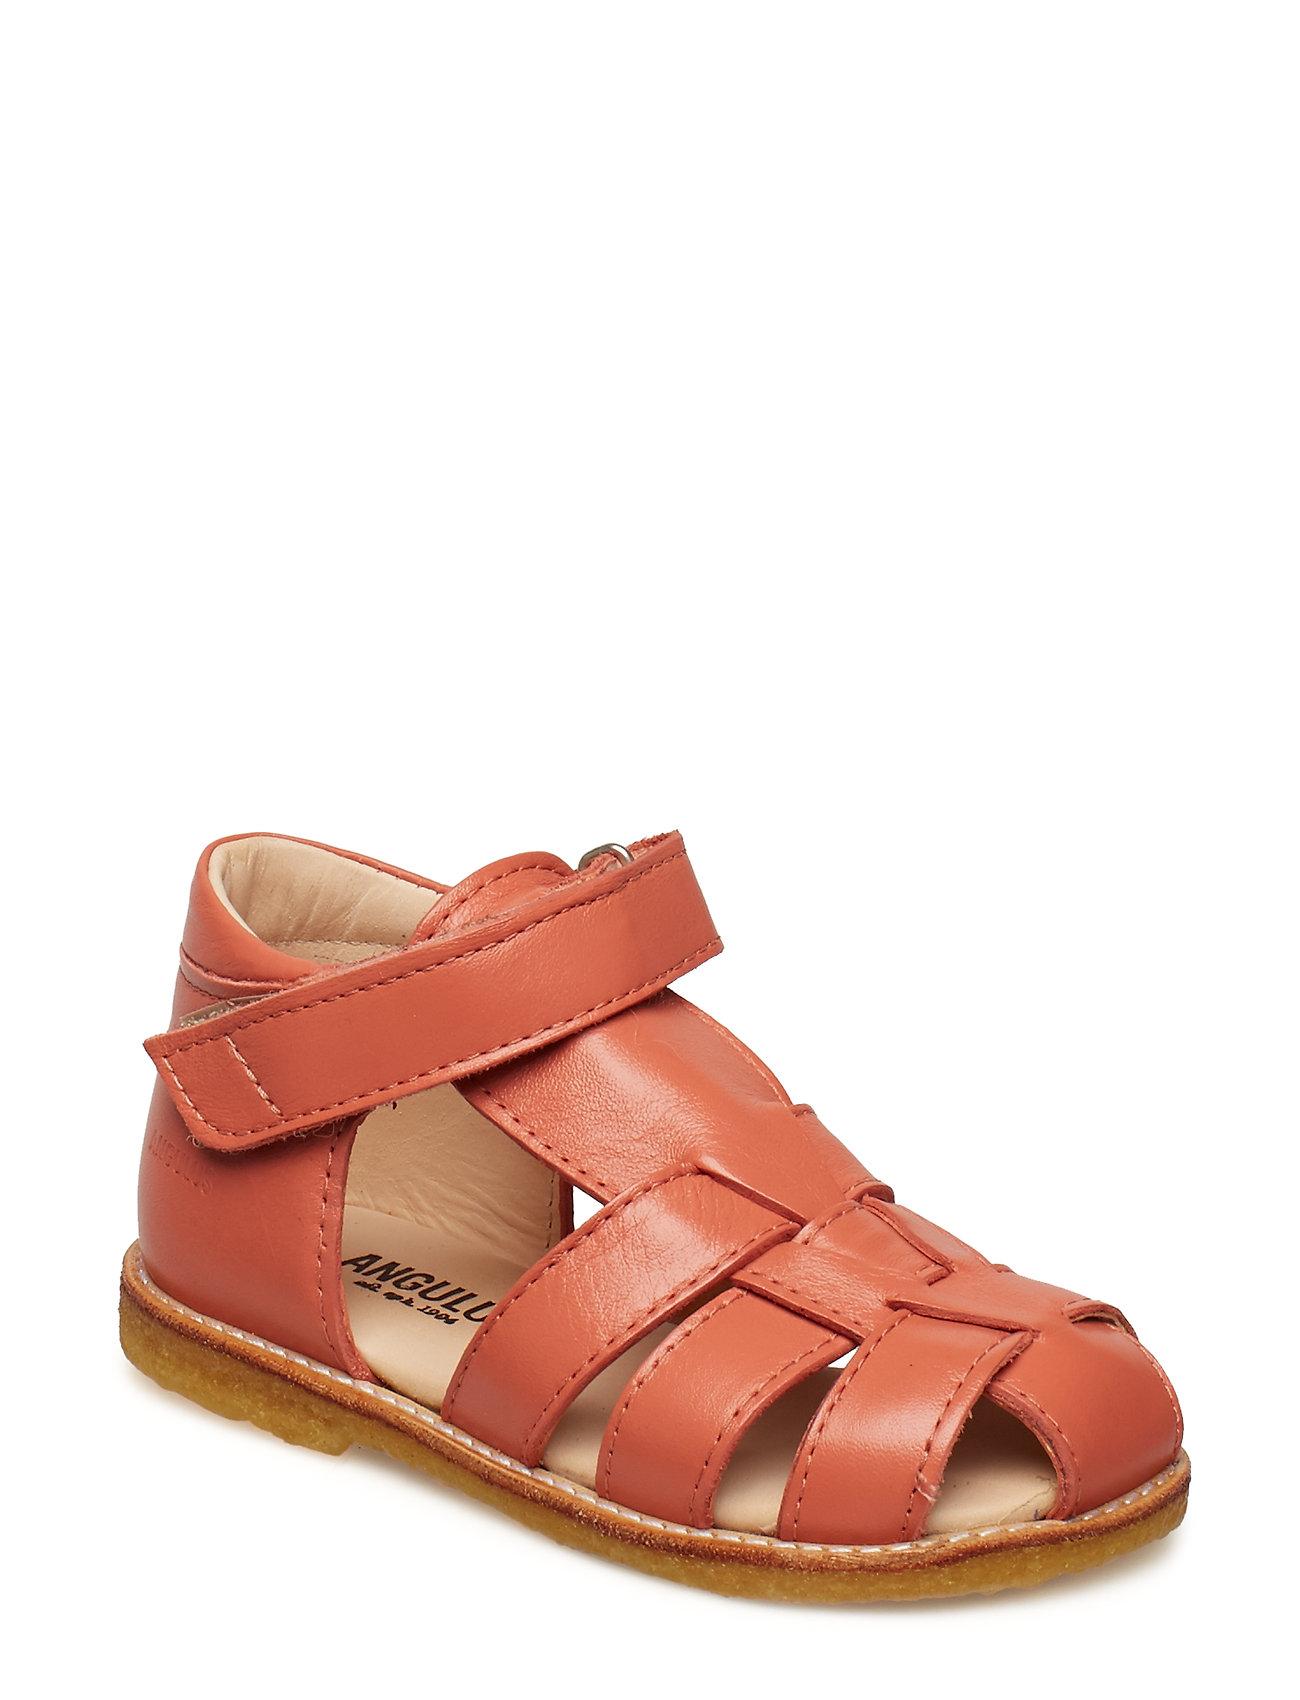 ANGULUS Baby sandal - 1436 LIGHT CORAL